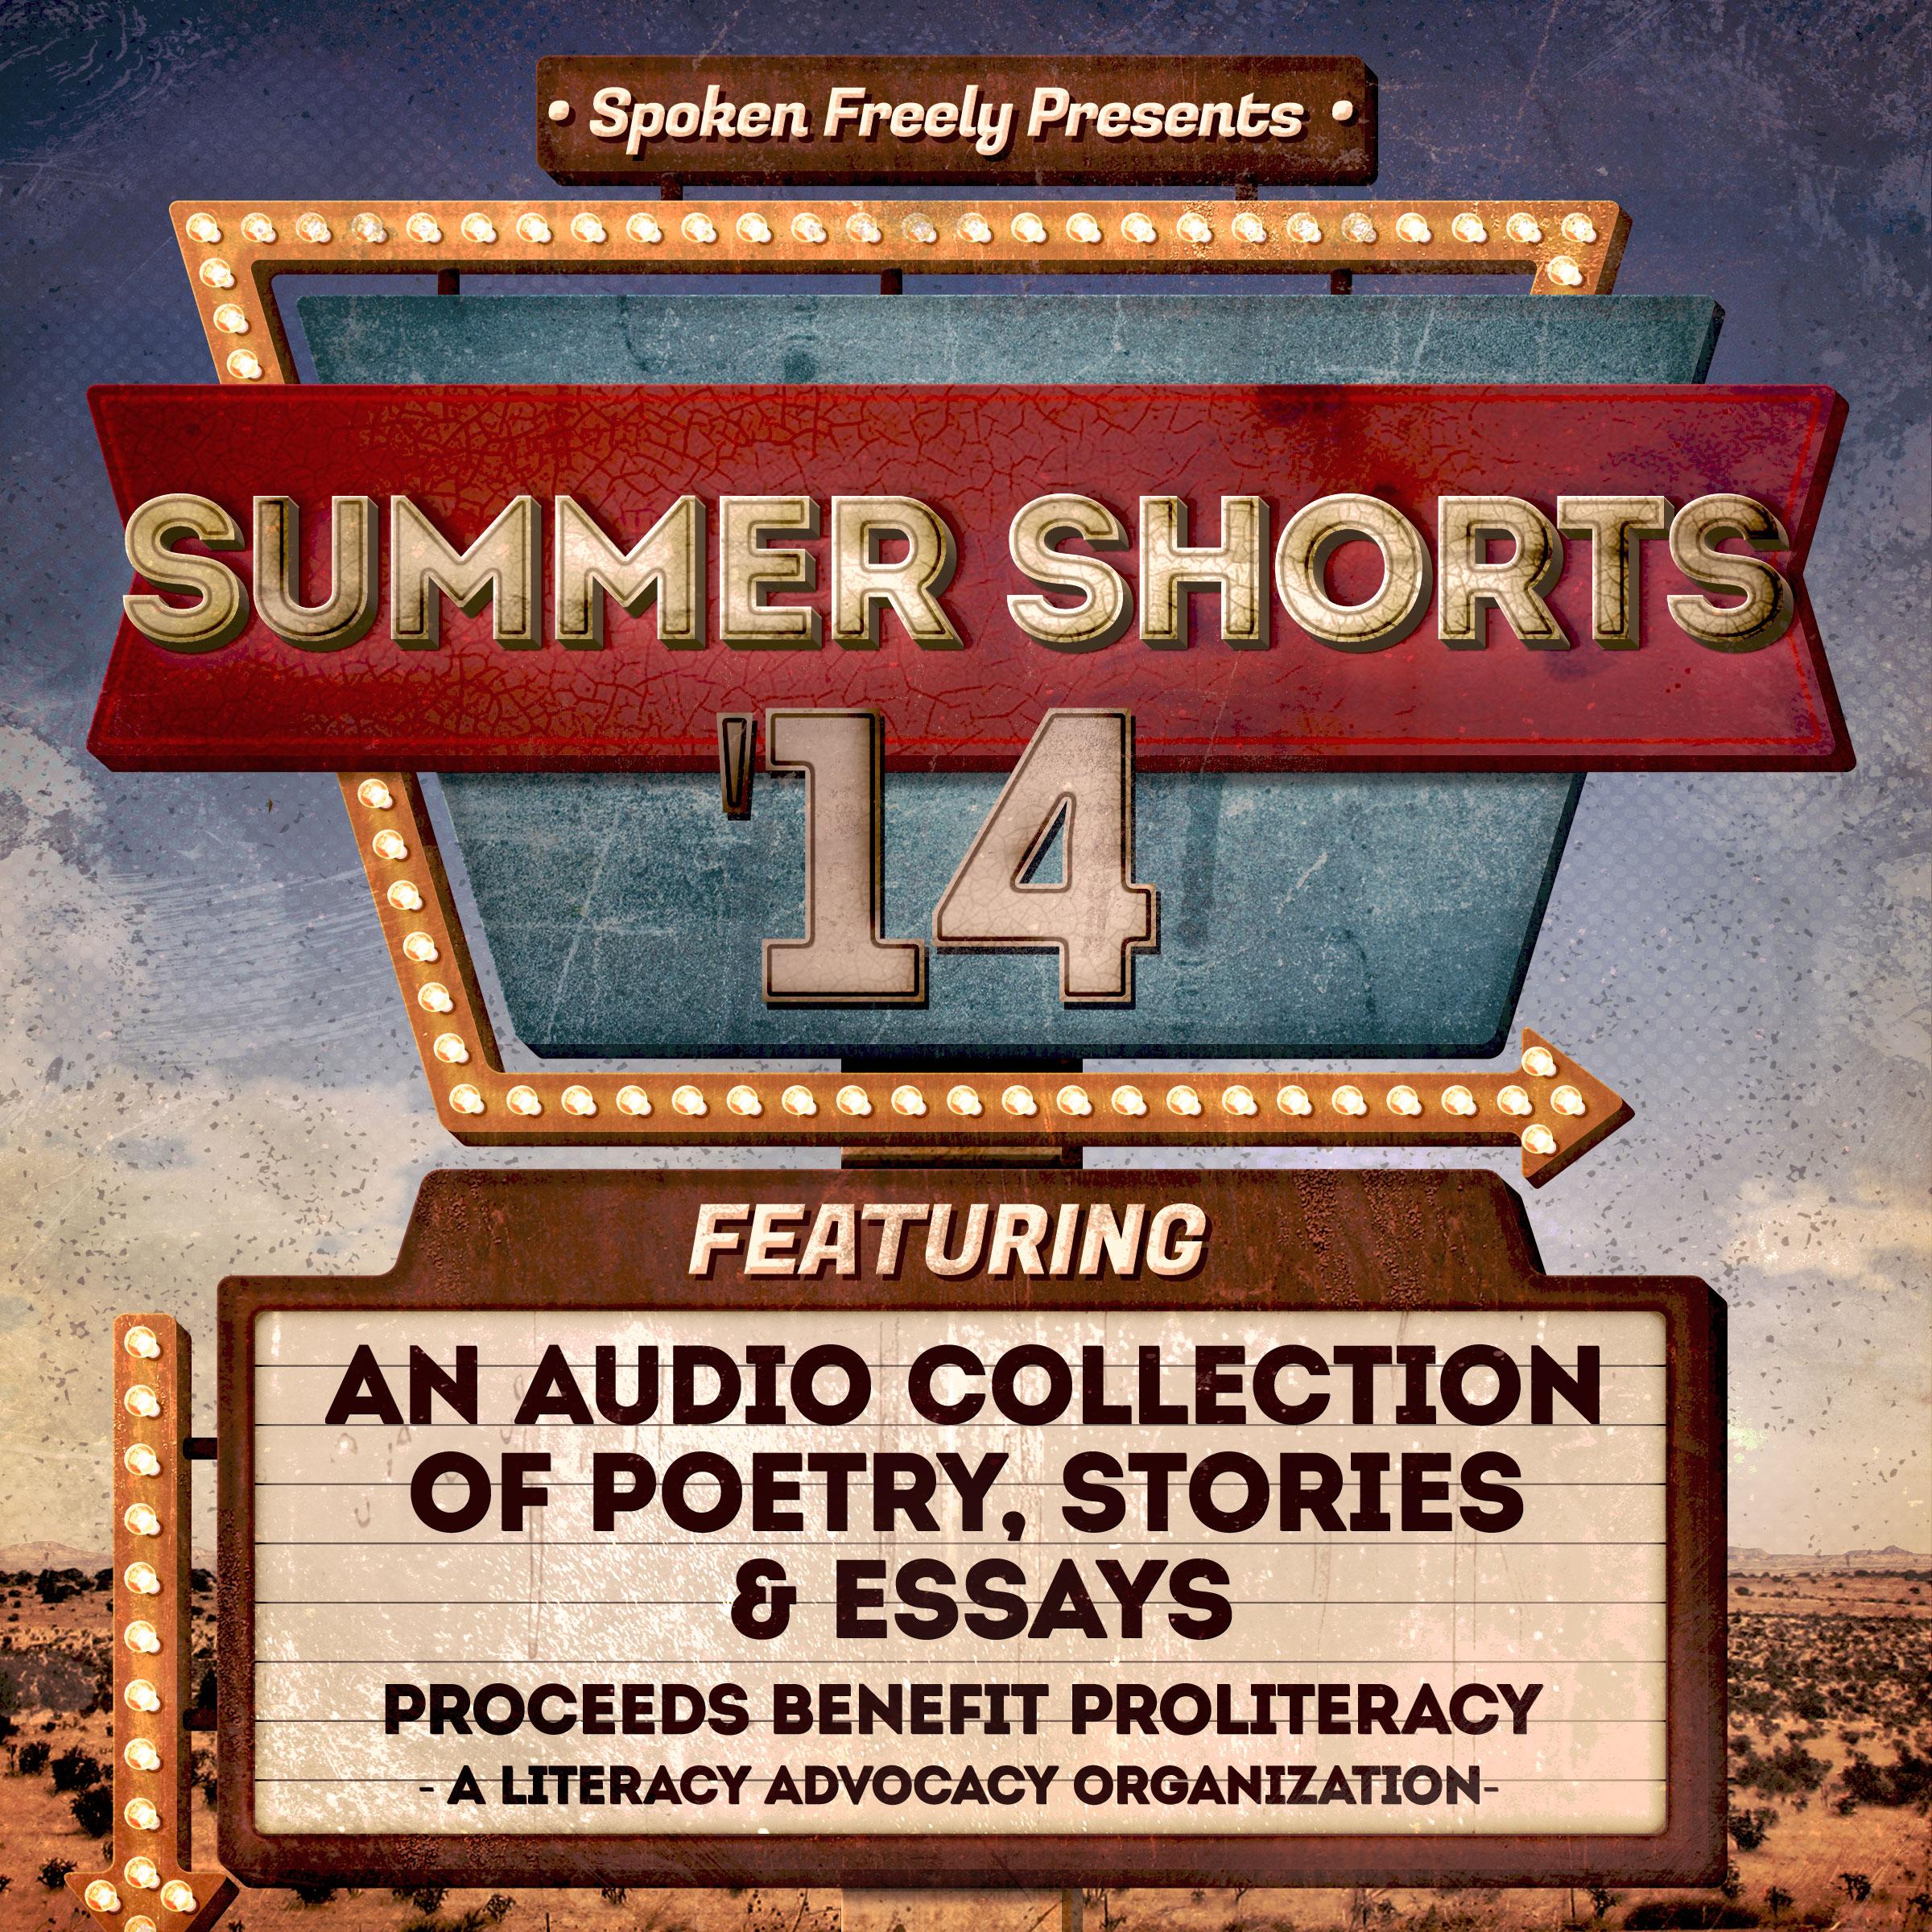 Summer Shorts '14 Blog Hop: The Cask of Amontillado by Edgar Allan Poe